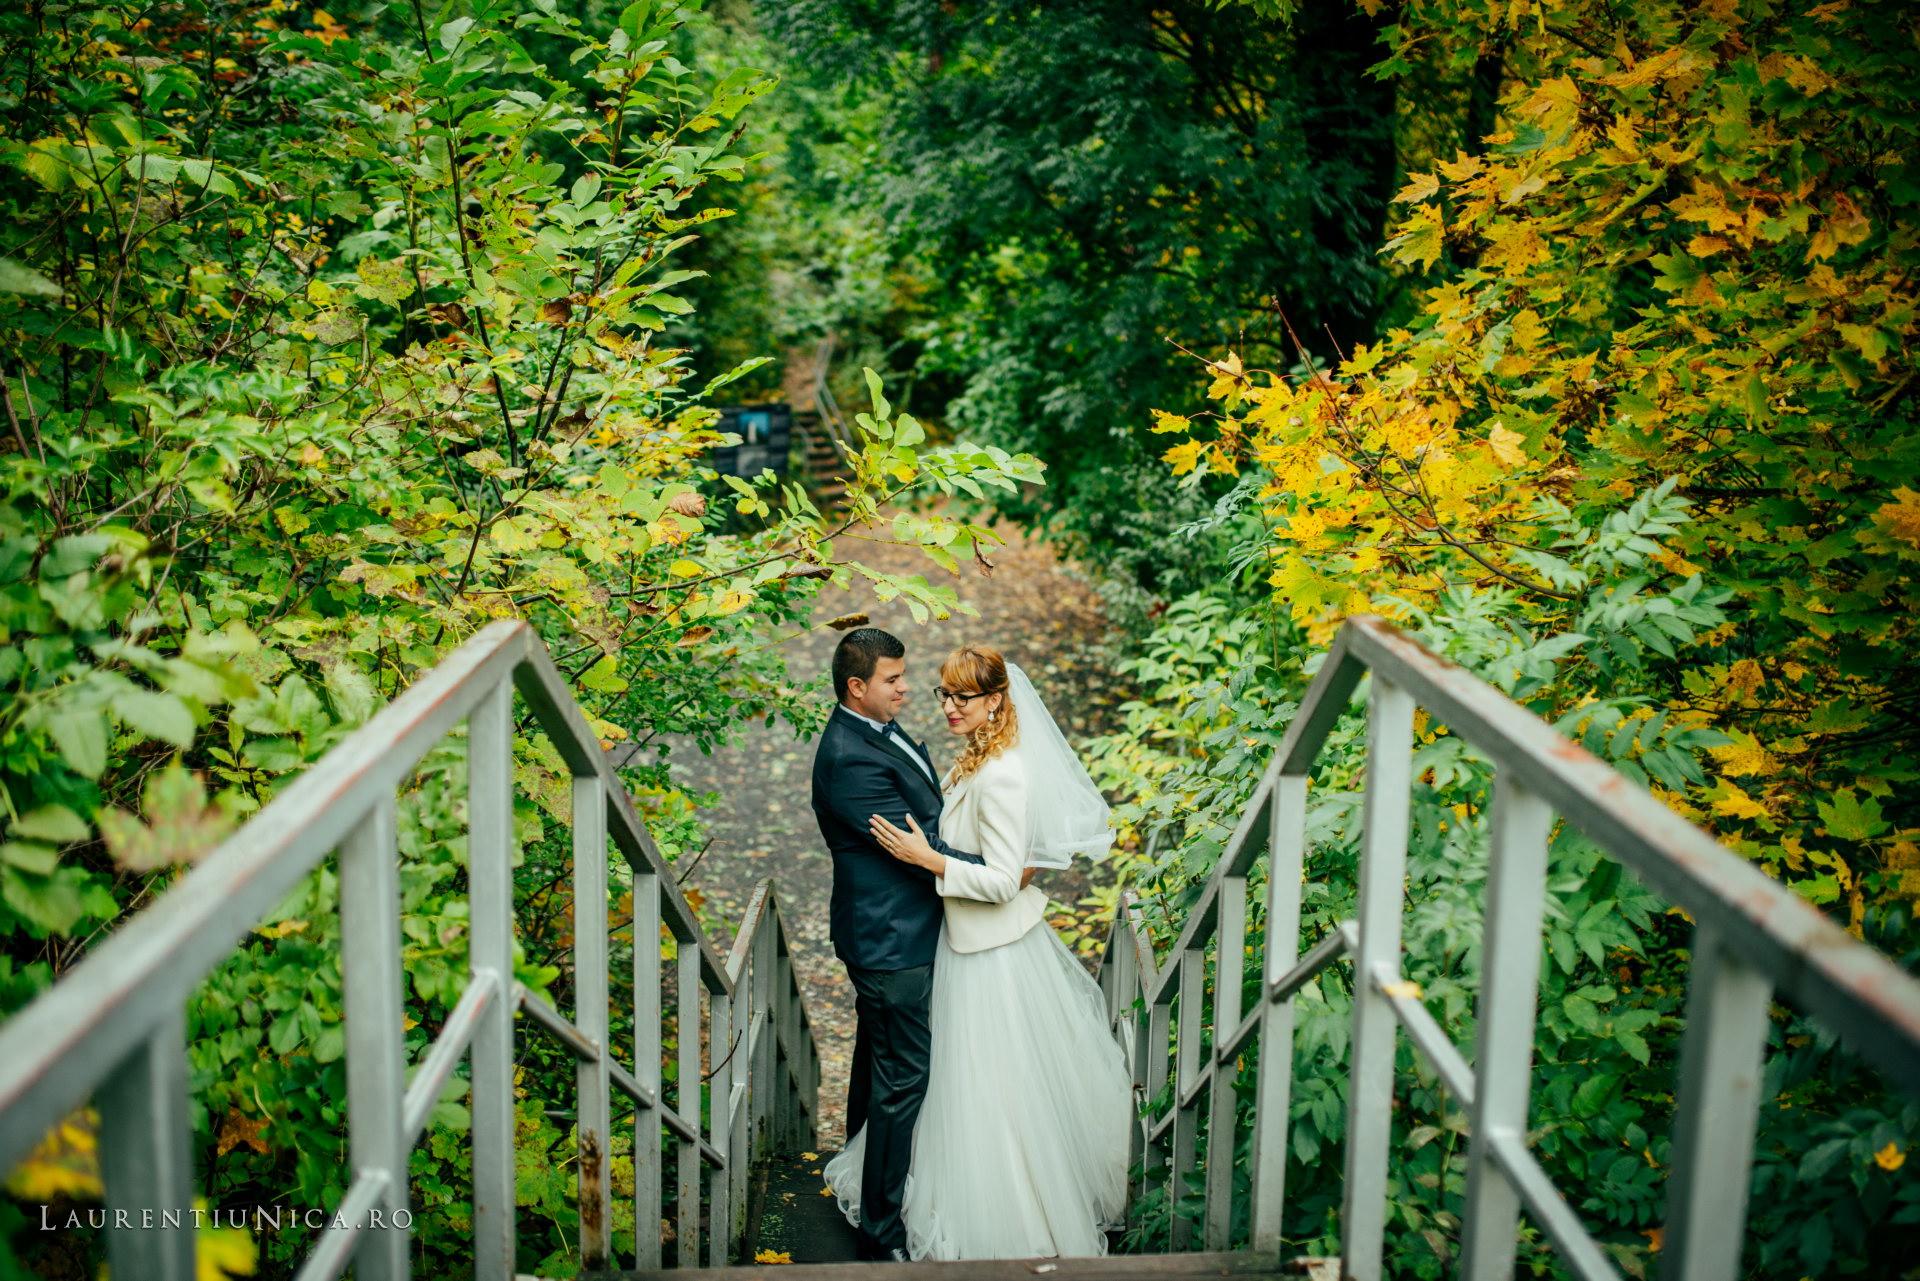 iulia-si-cosmin-fotografii-after-wedding-brasov-laurentiu-nica02